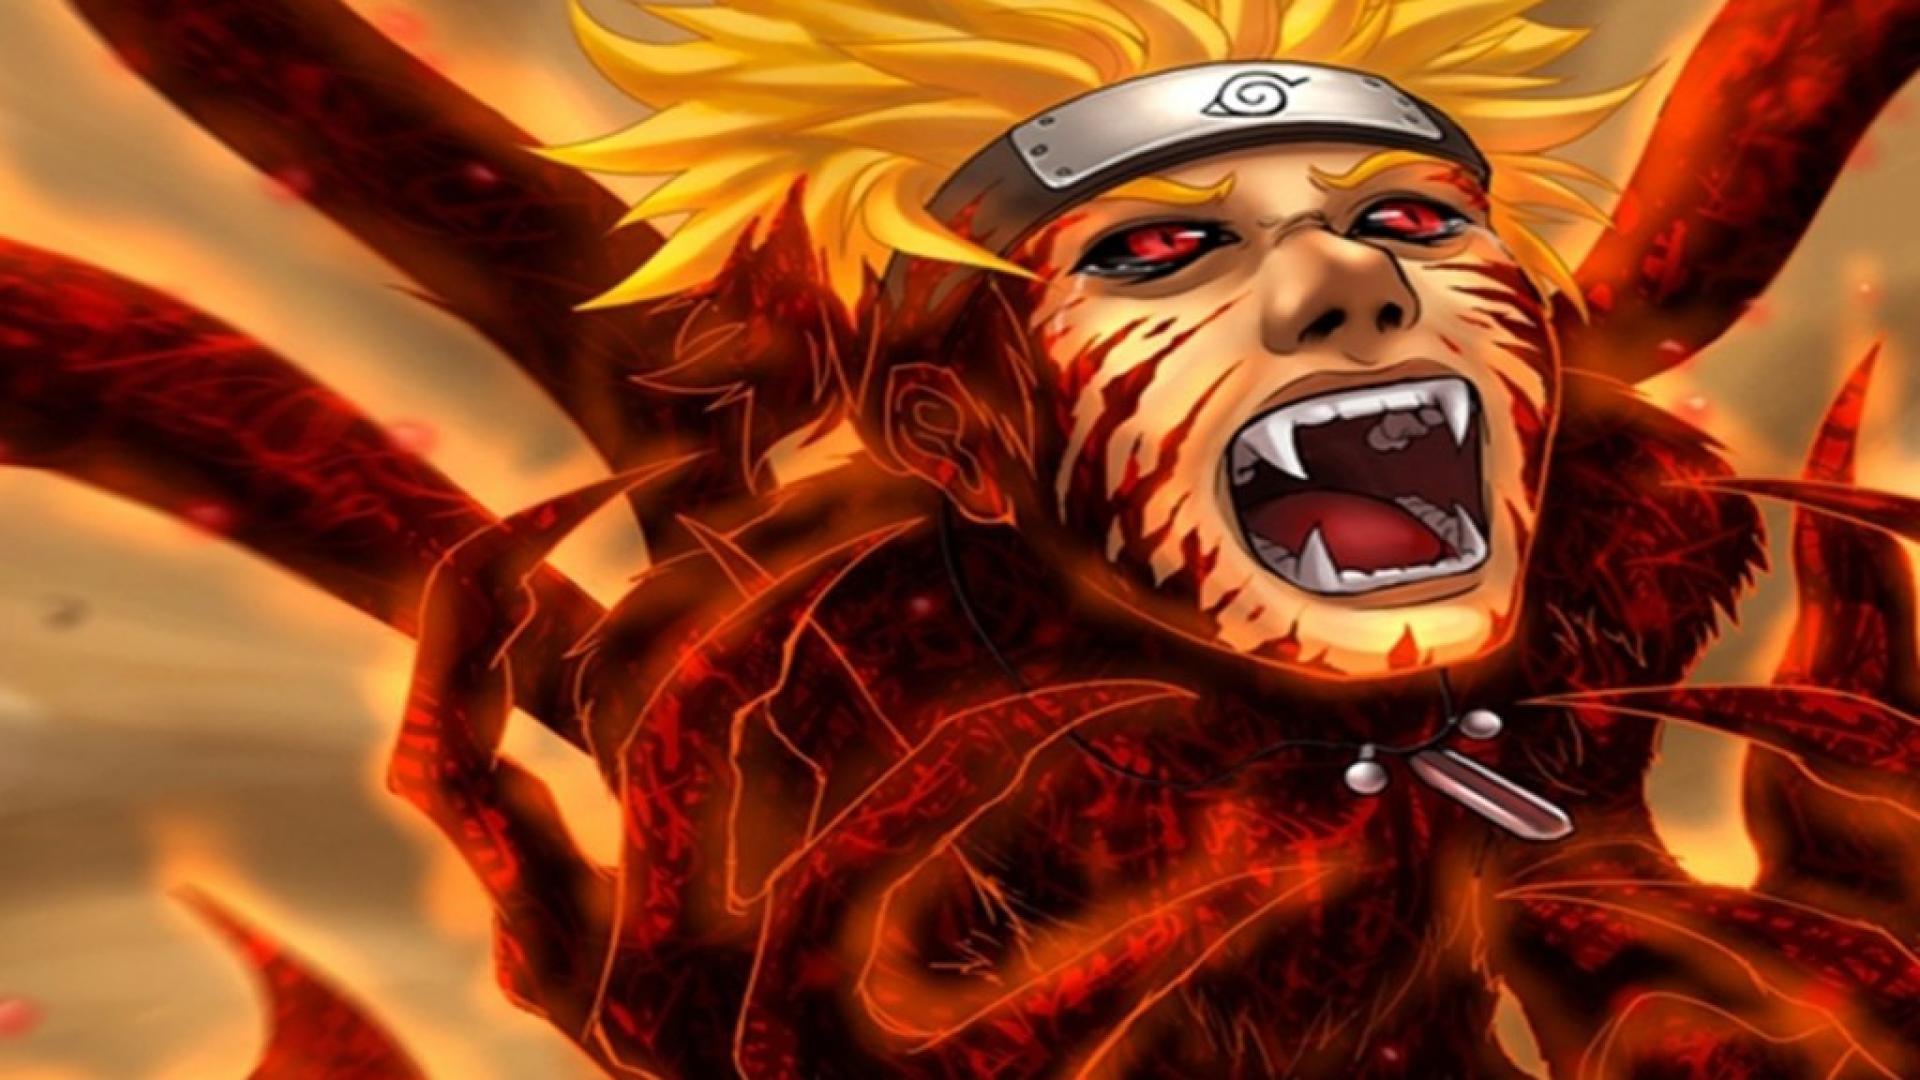 49 Download Naruto Wallpaper On Wallpapersafari